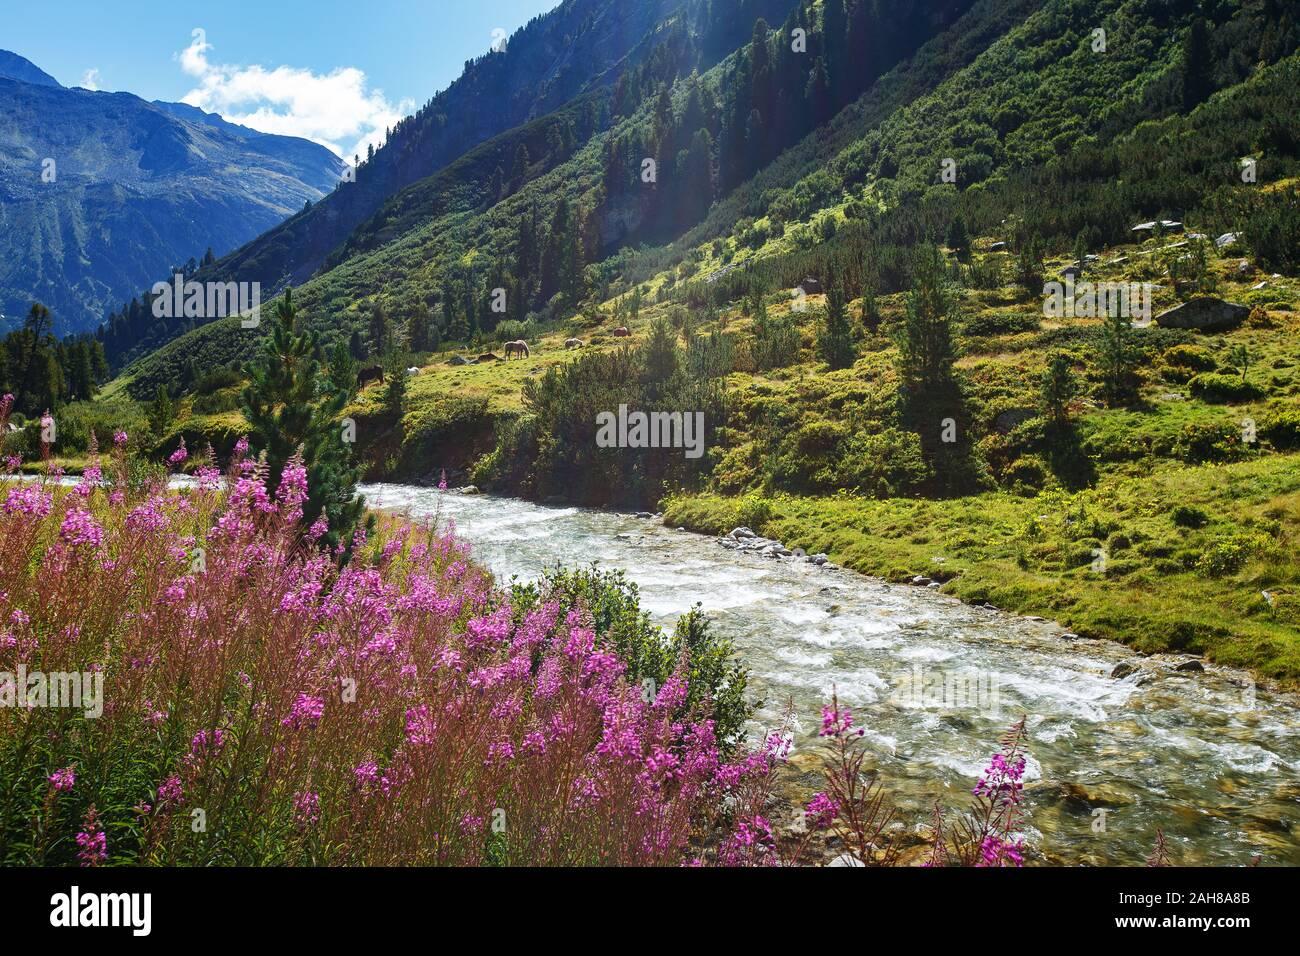 Mountain flowers and river. Rainbachtal. Alpine landscape, a side valley of the Krimmler Achental. Hohe Tauern National Park. Austrian Alps. Stock Photo